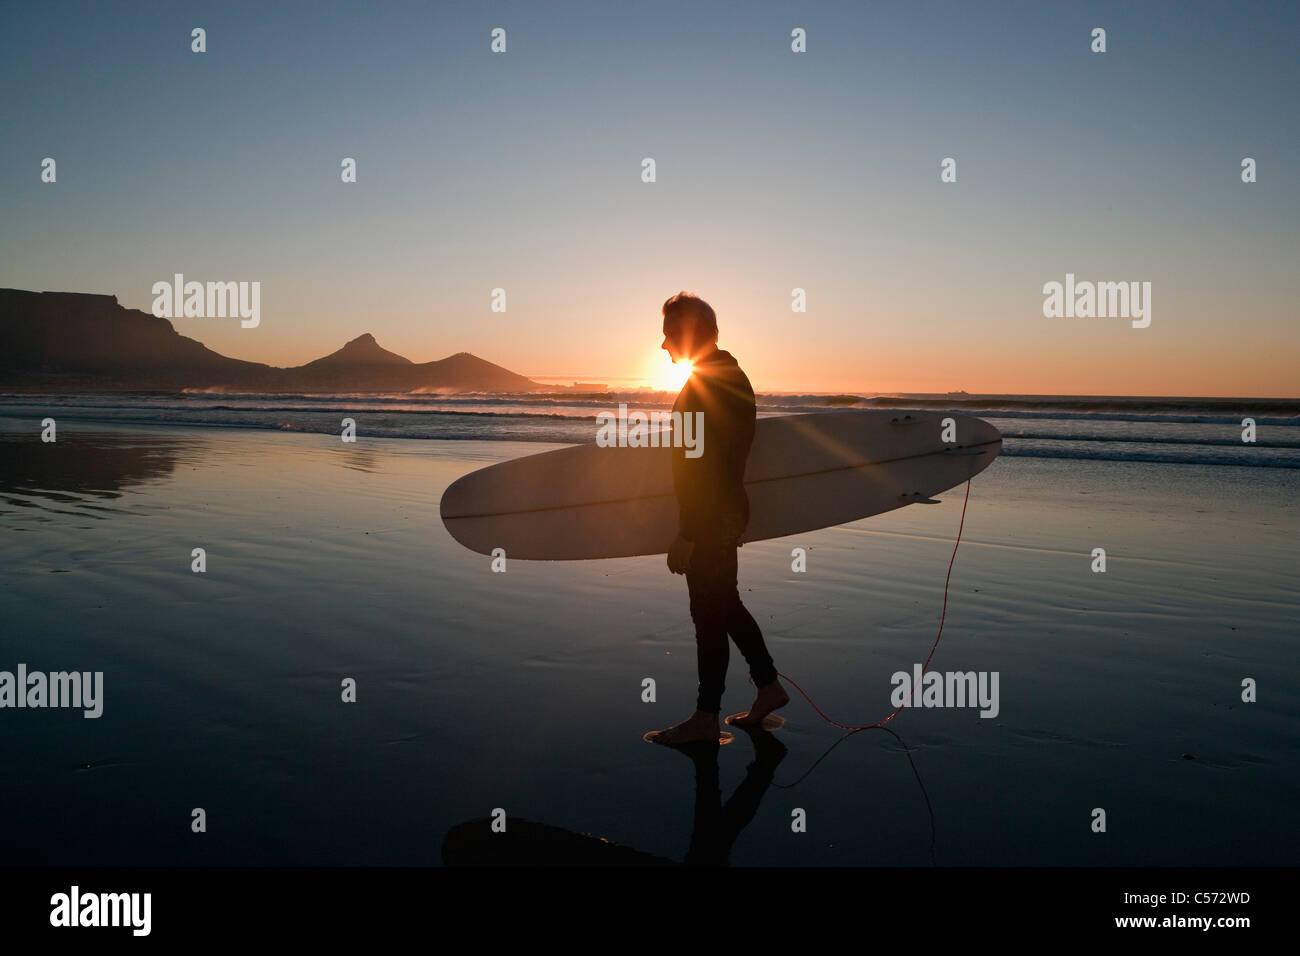 Surfer am Strand zu Fuß Stockbild